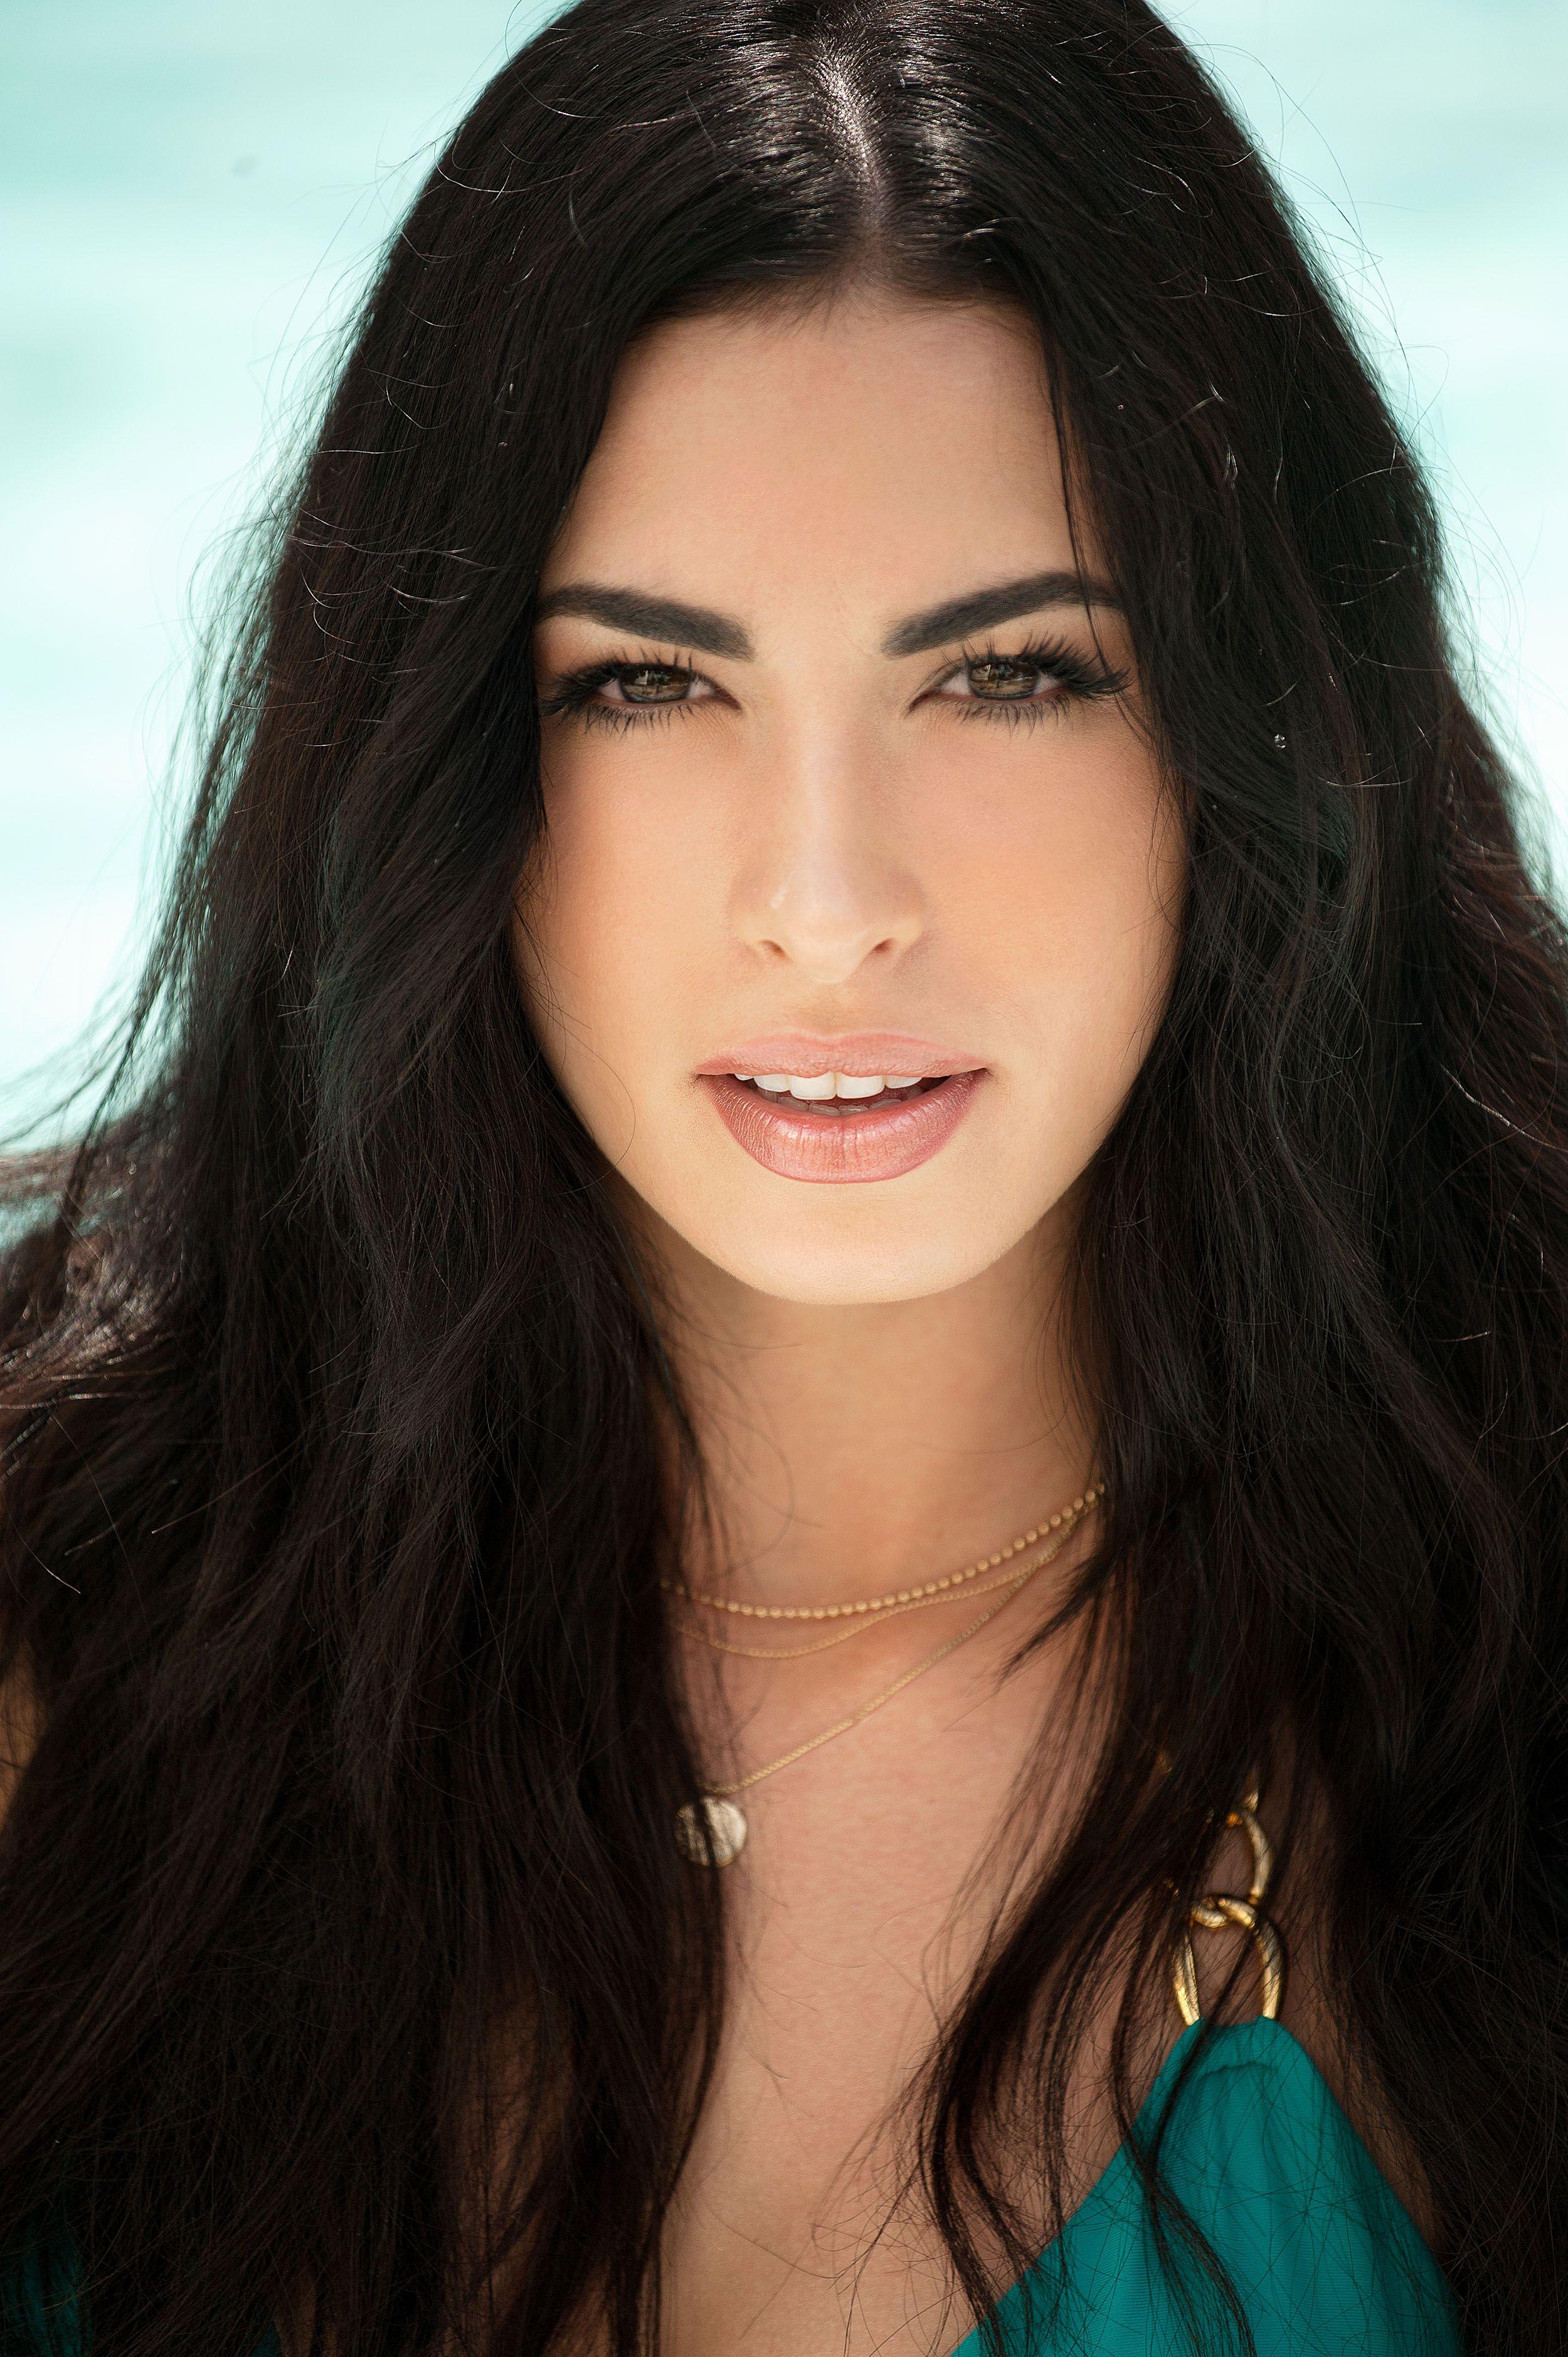 Miss Puerto Rico 2017 Miss Cagüas Nicole Marie Colón Rivera